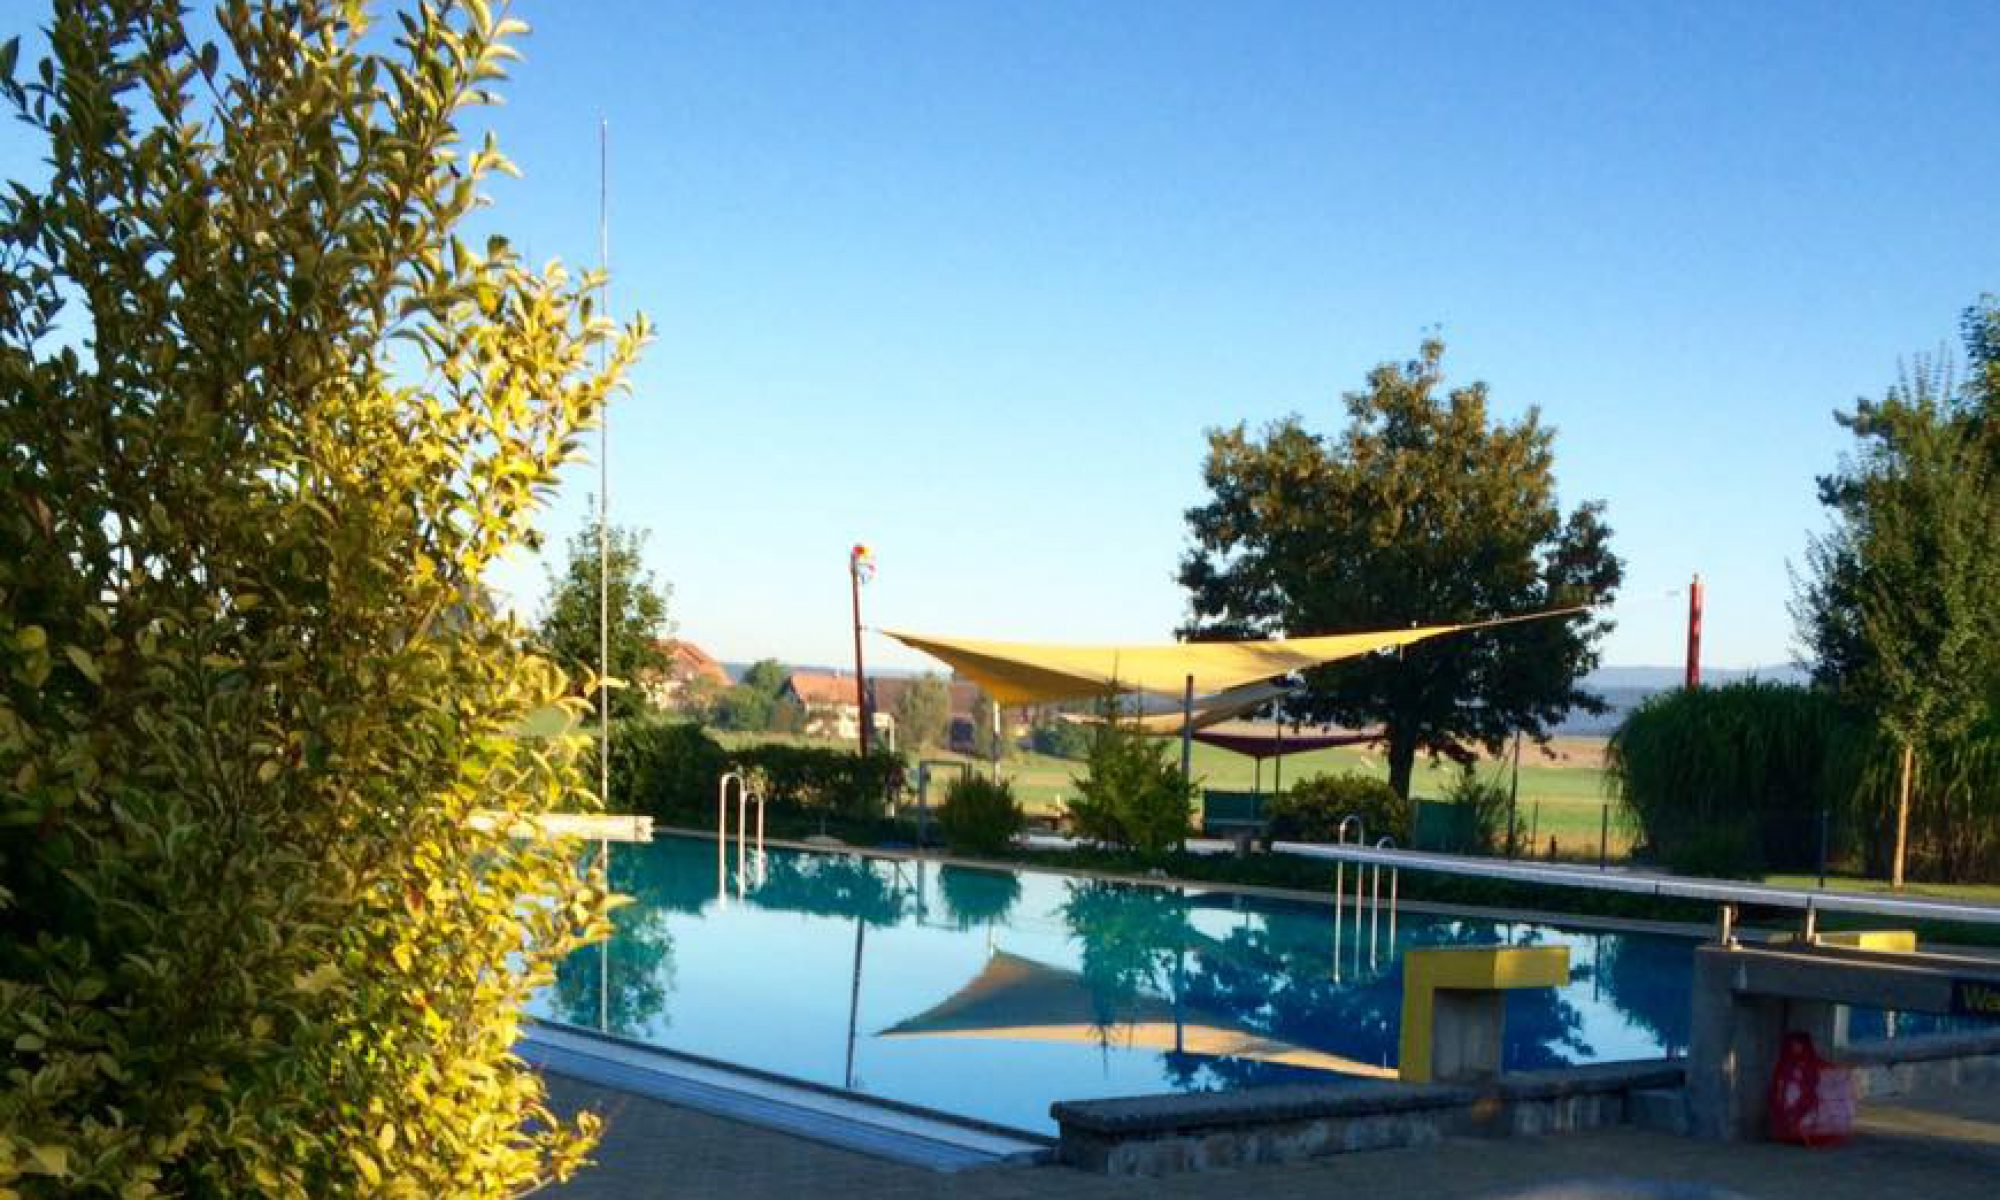 Schwimmbad Fraubrunnen